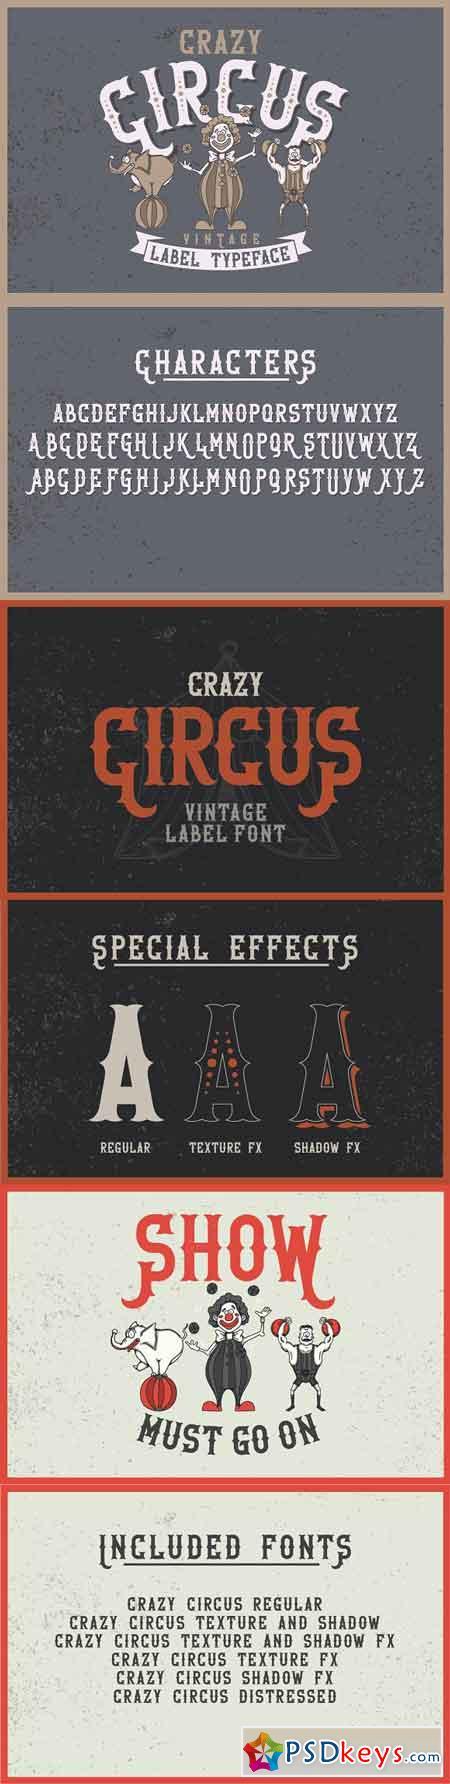 Crazy Circus typeface 1323992